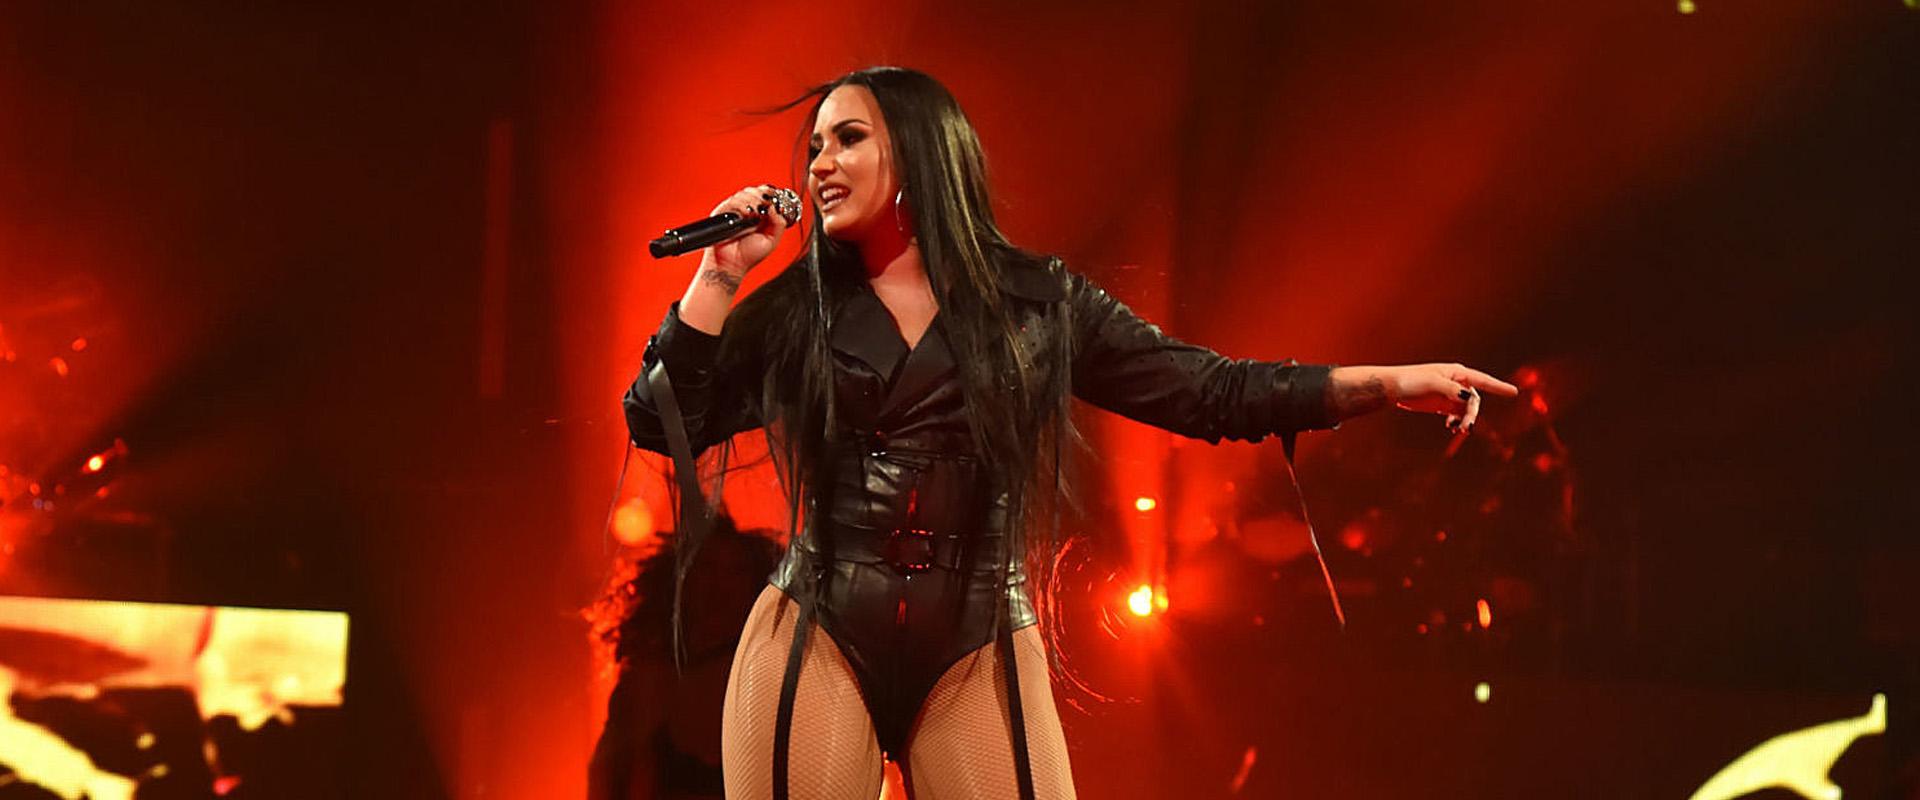 Demi Lovato Tell Me You Love Me Tour